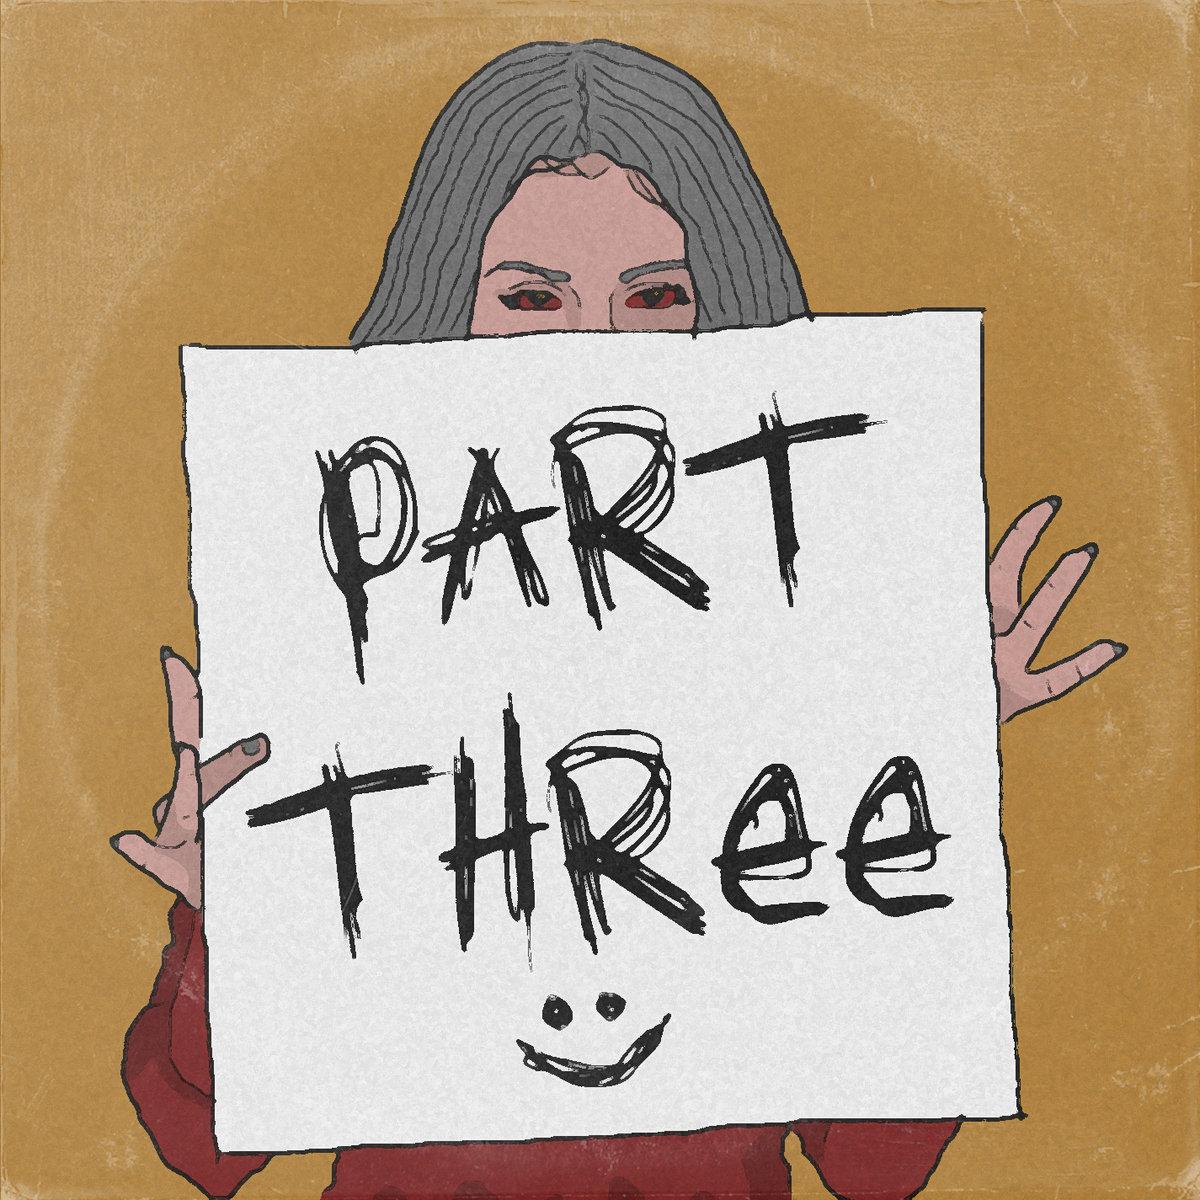 PART THREE